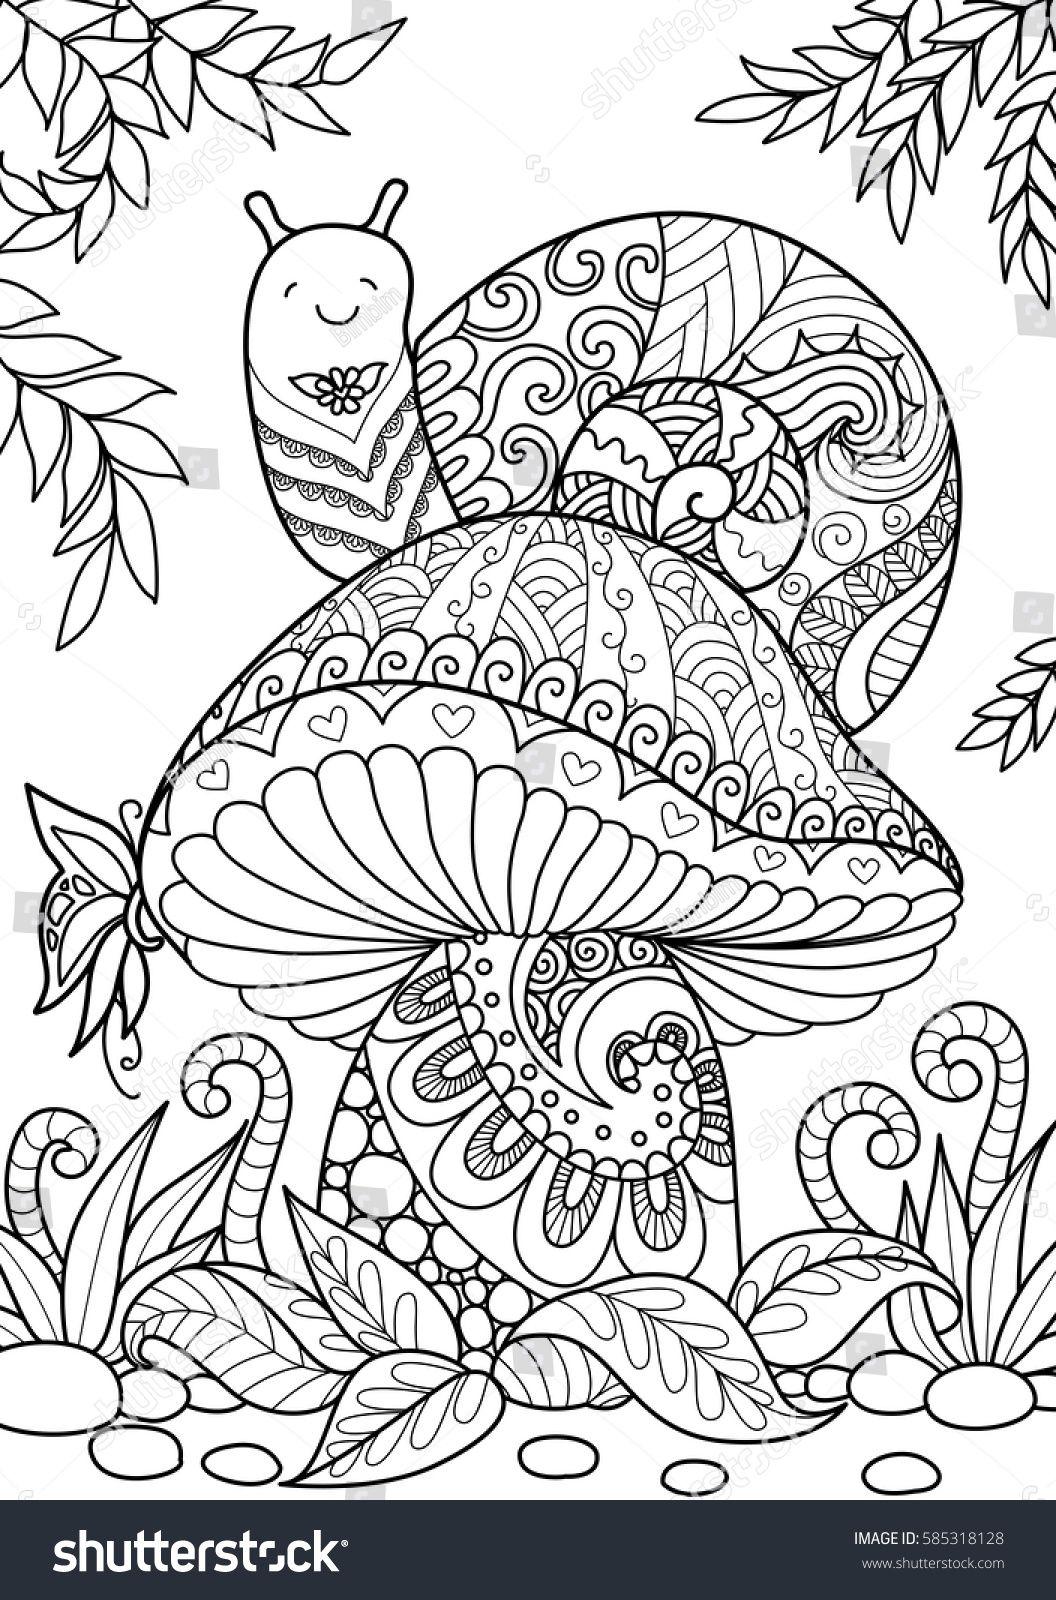 Snail Sitting On Beautiful Mushroom For T Shirt Design